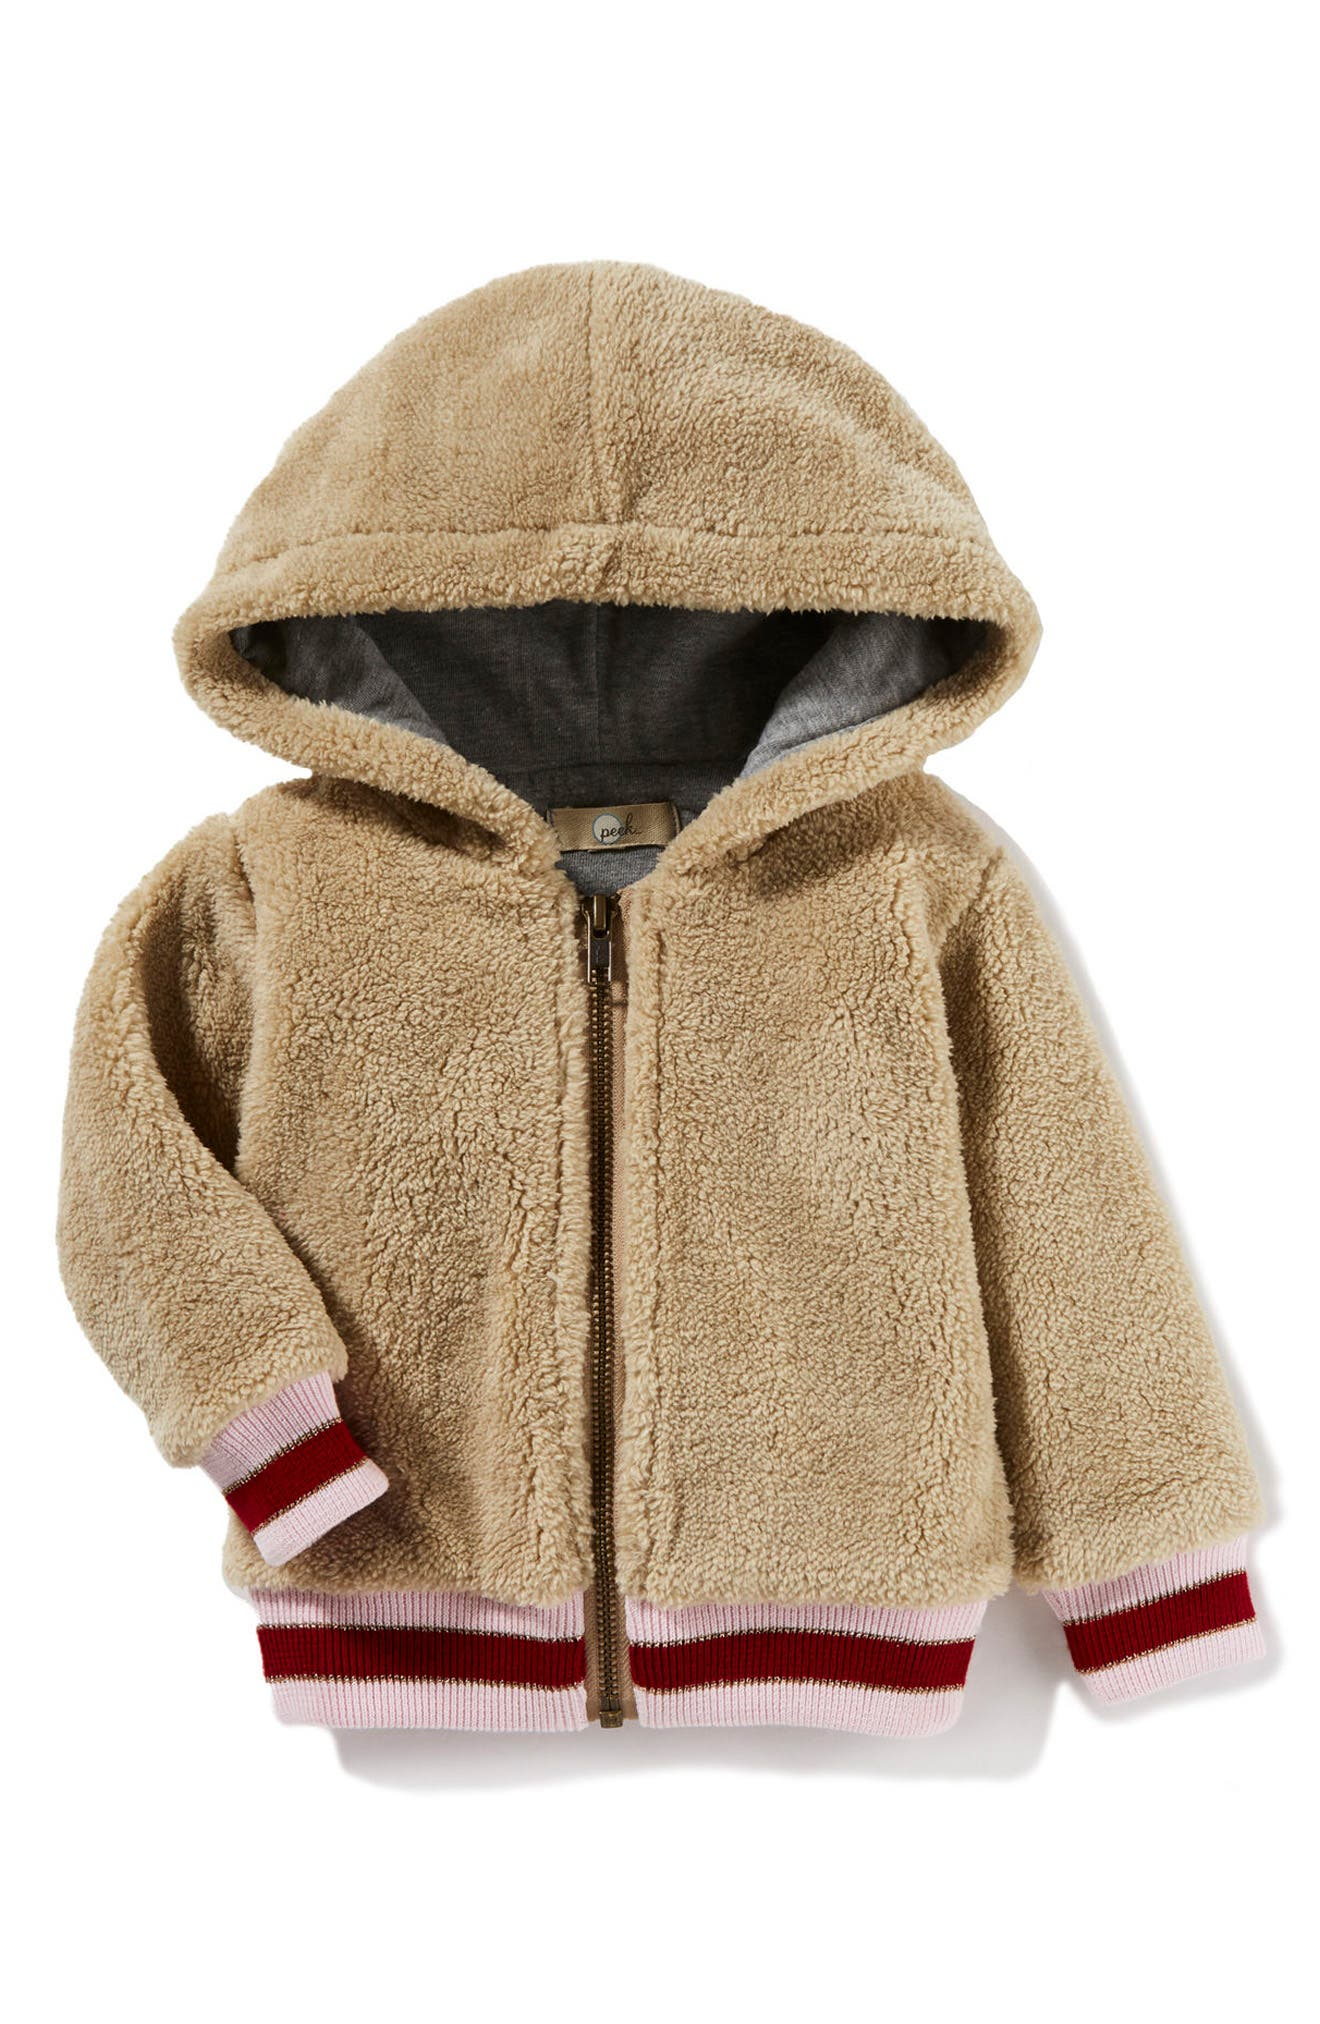 Peek Hooded Fleece Bomber Jacket,                         Main,                         color,